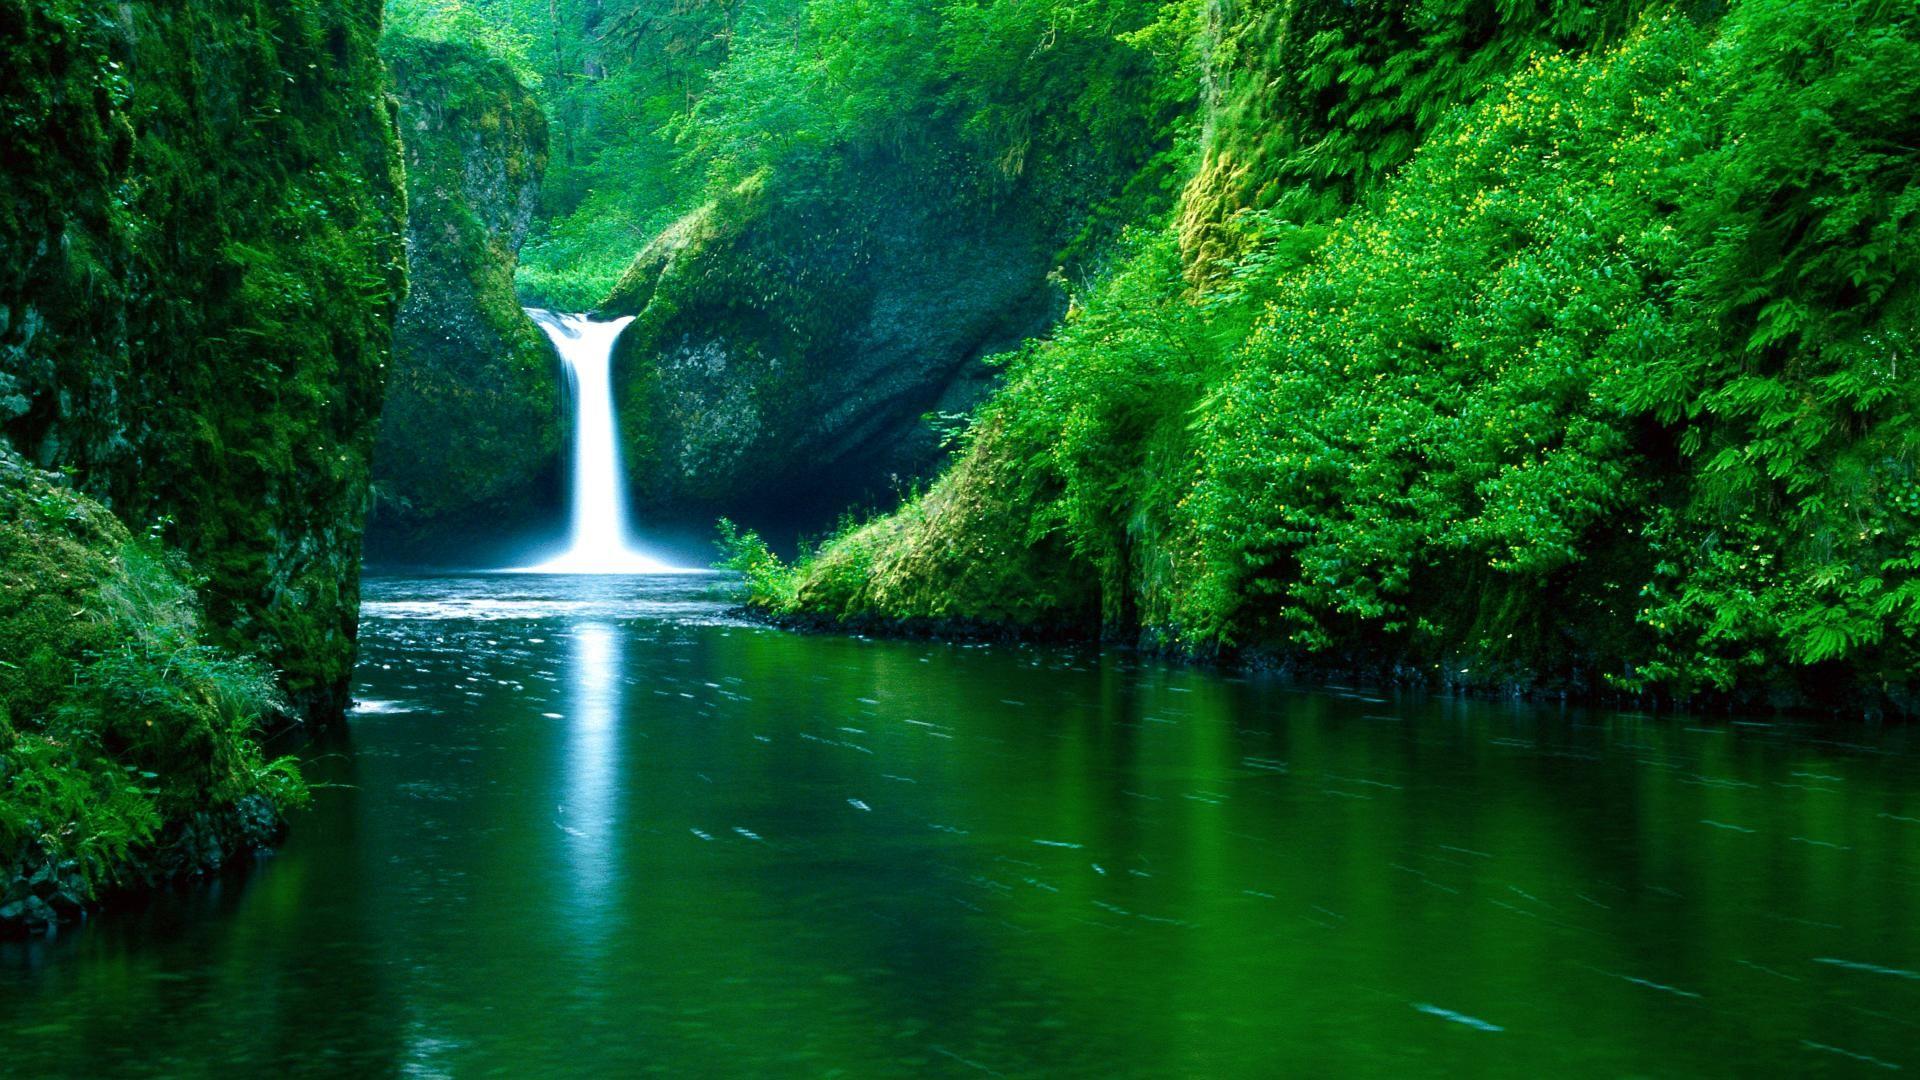 Pin By Get Wall On I Dig Jungles Waterfall Waterfall Wallpaper Punchbowl Falls